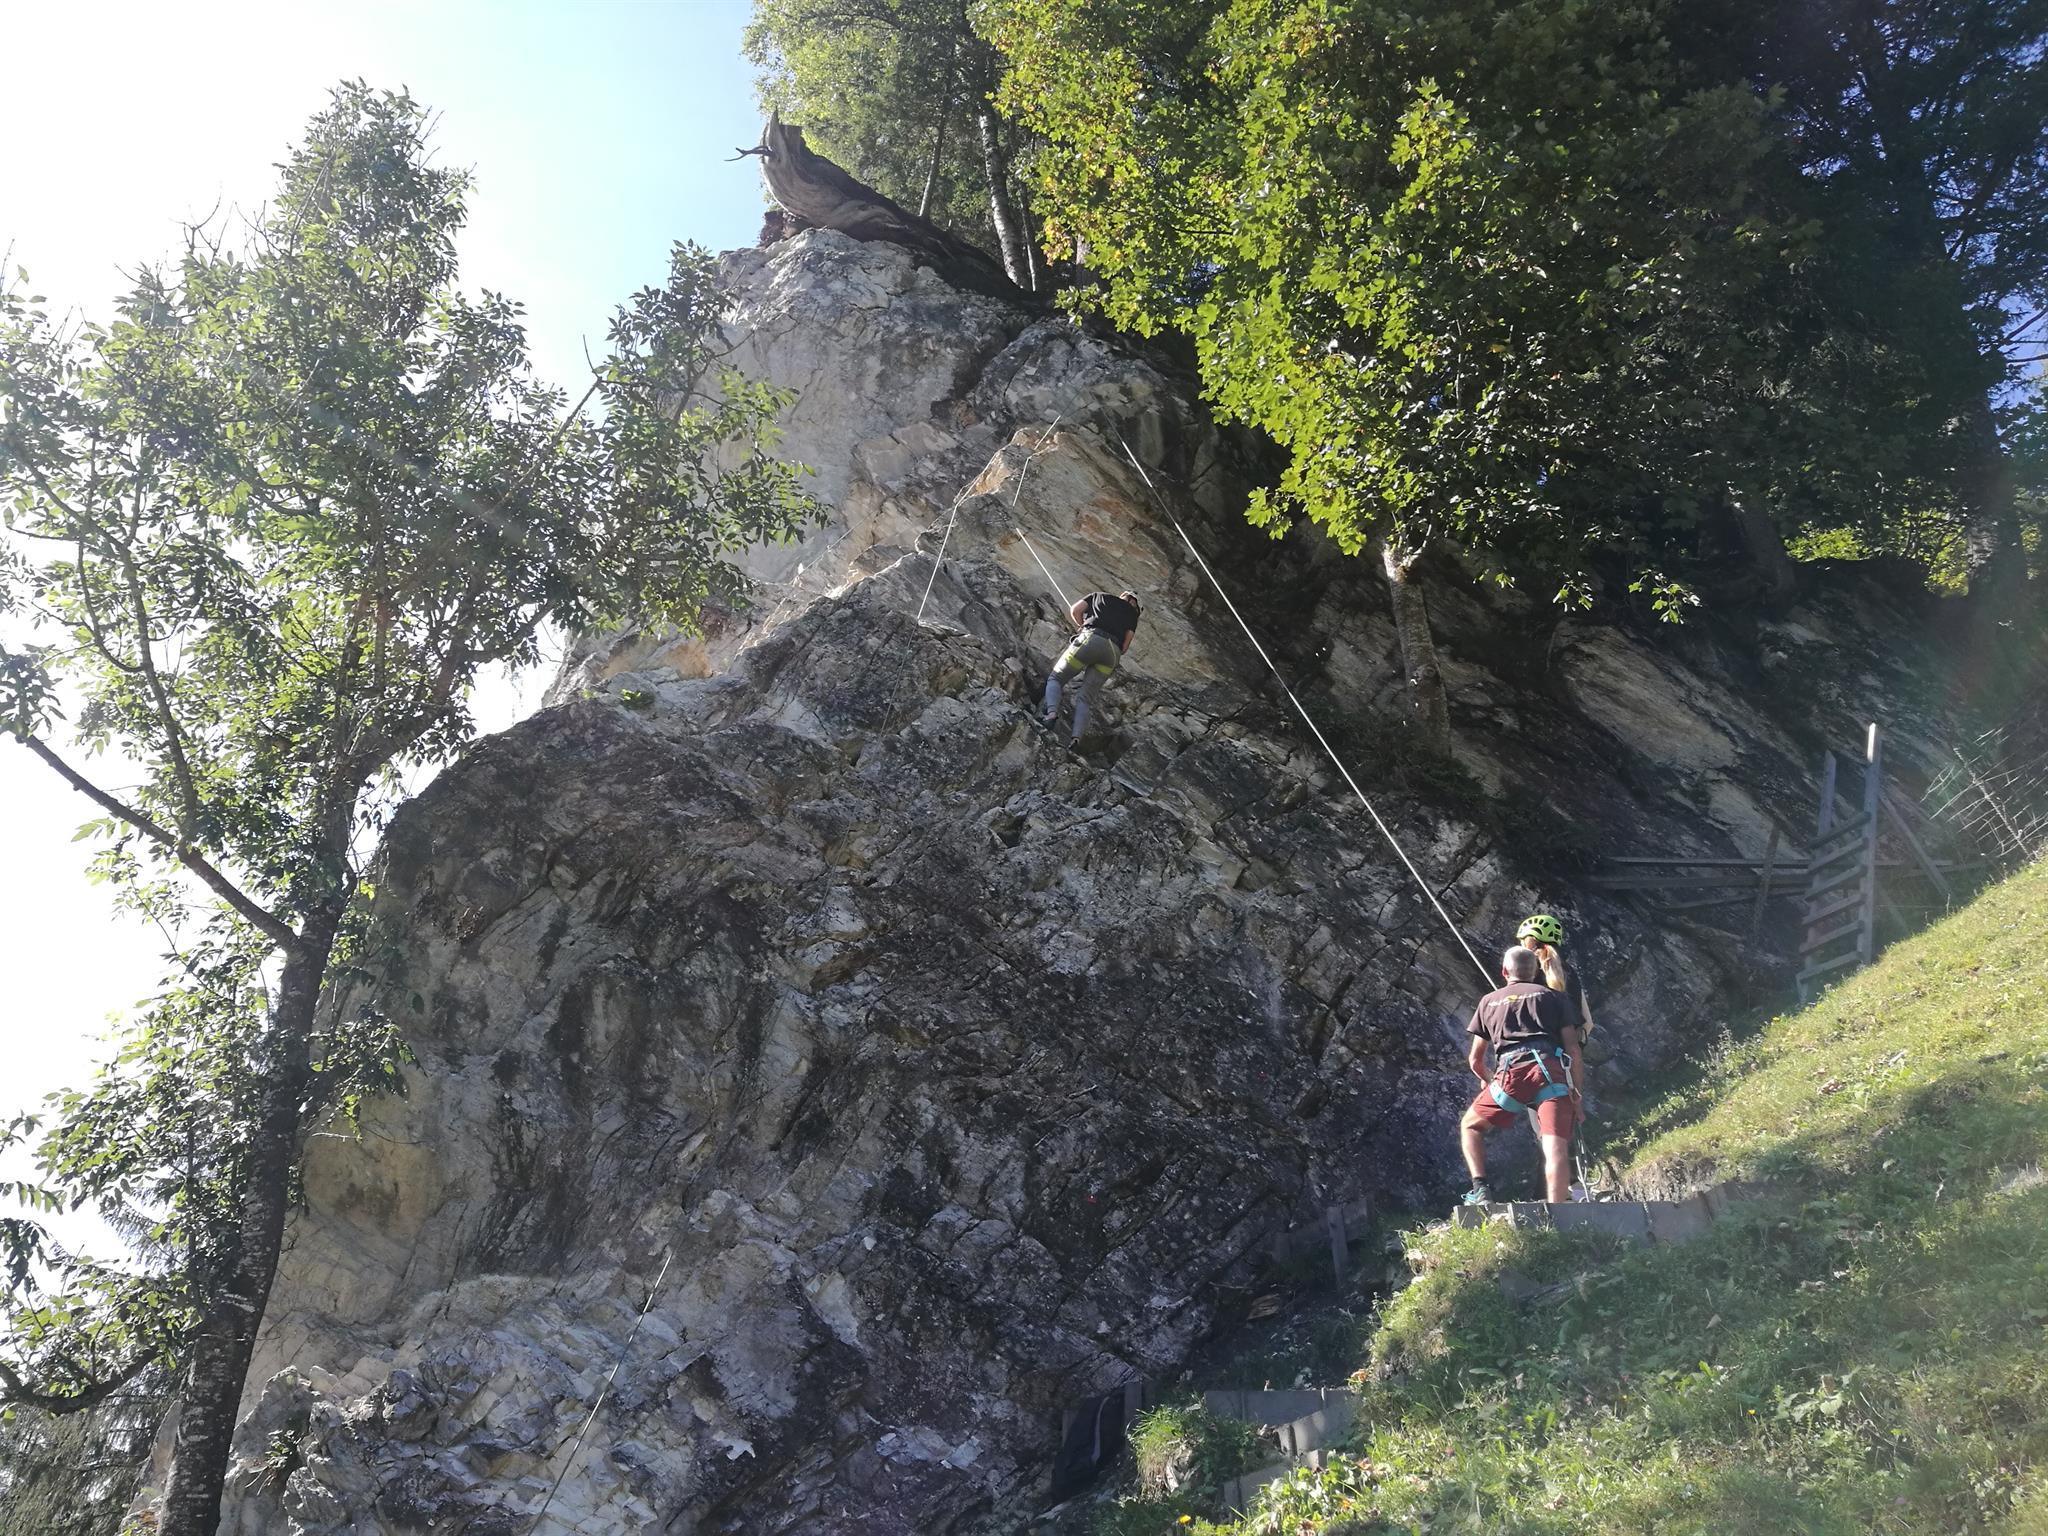 berg_gesund_rock_climping_,